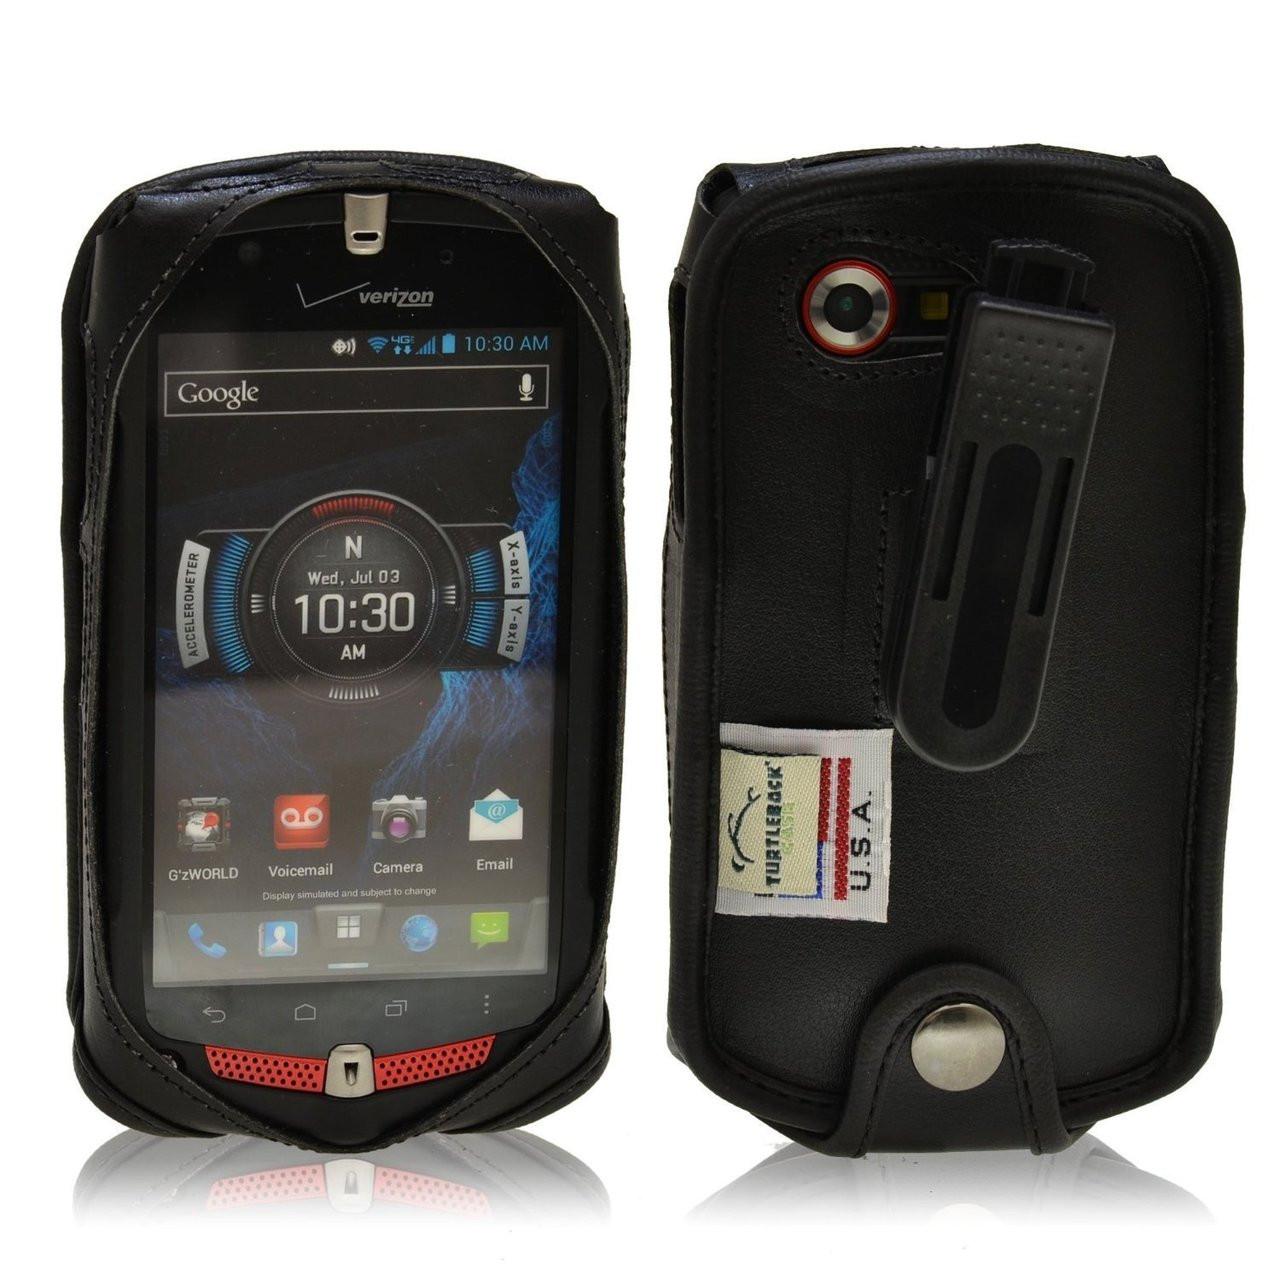 LG lg exalt phone case : ... C811 Black Leather Case with Ratcheting Belt Clip - Turtleback Case